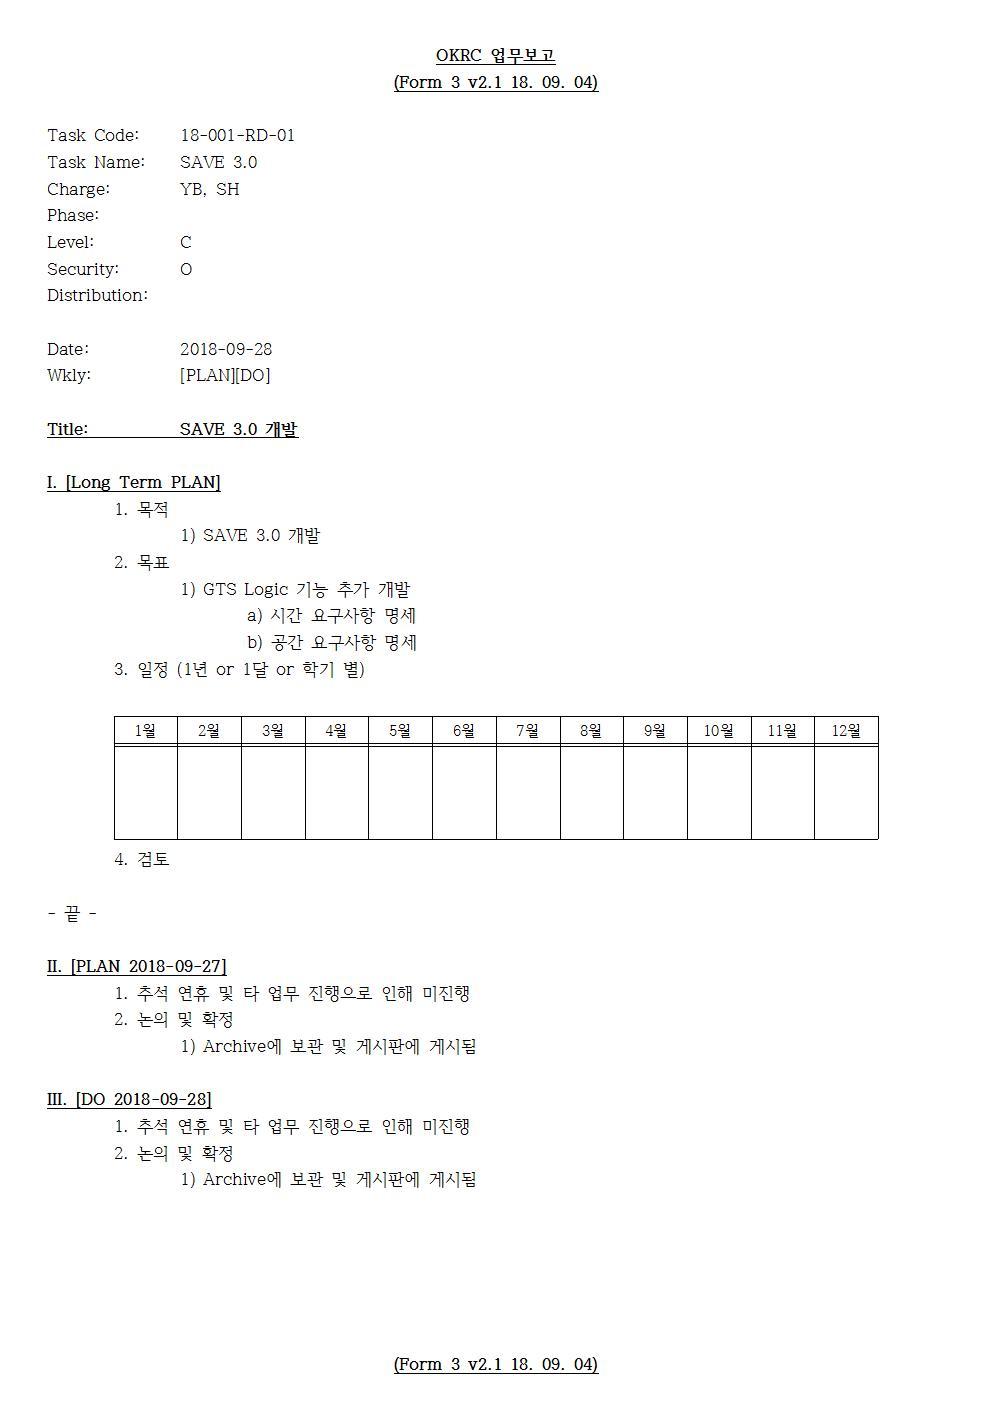 D-[18-001-RD-01]-[SAVE 3.0]-[2018-09-28][SH]001.jpg